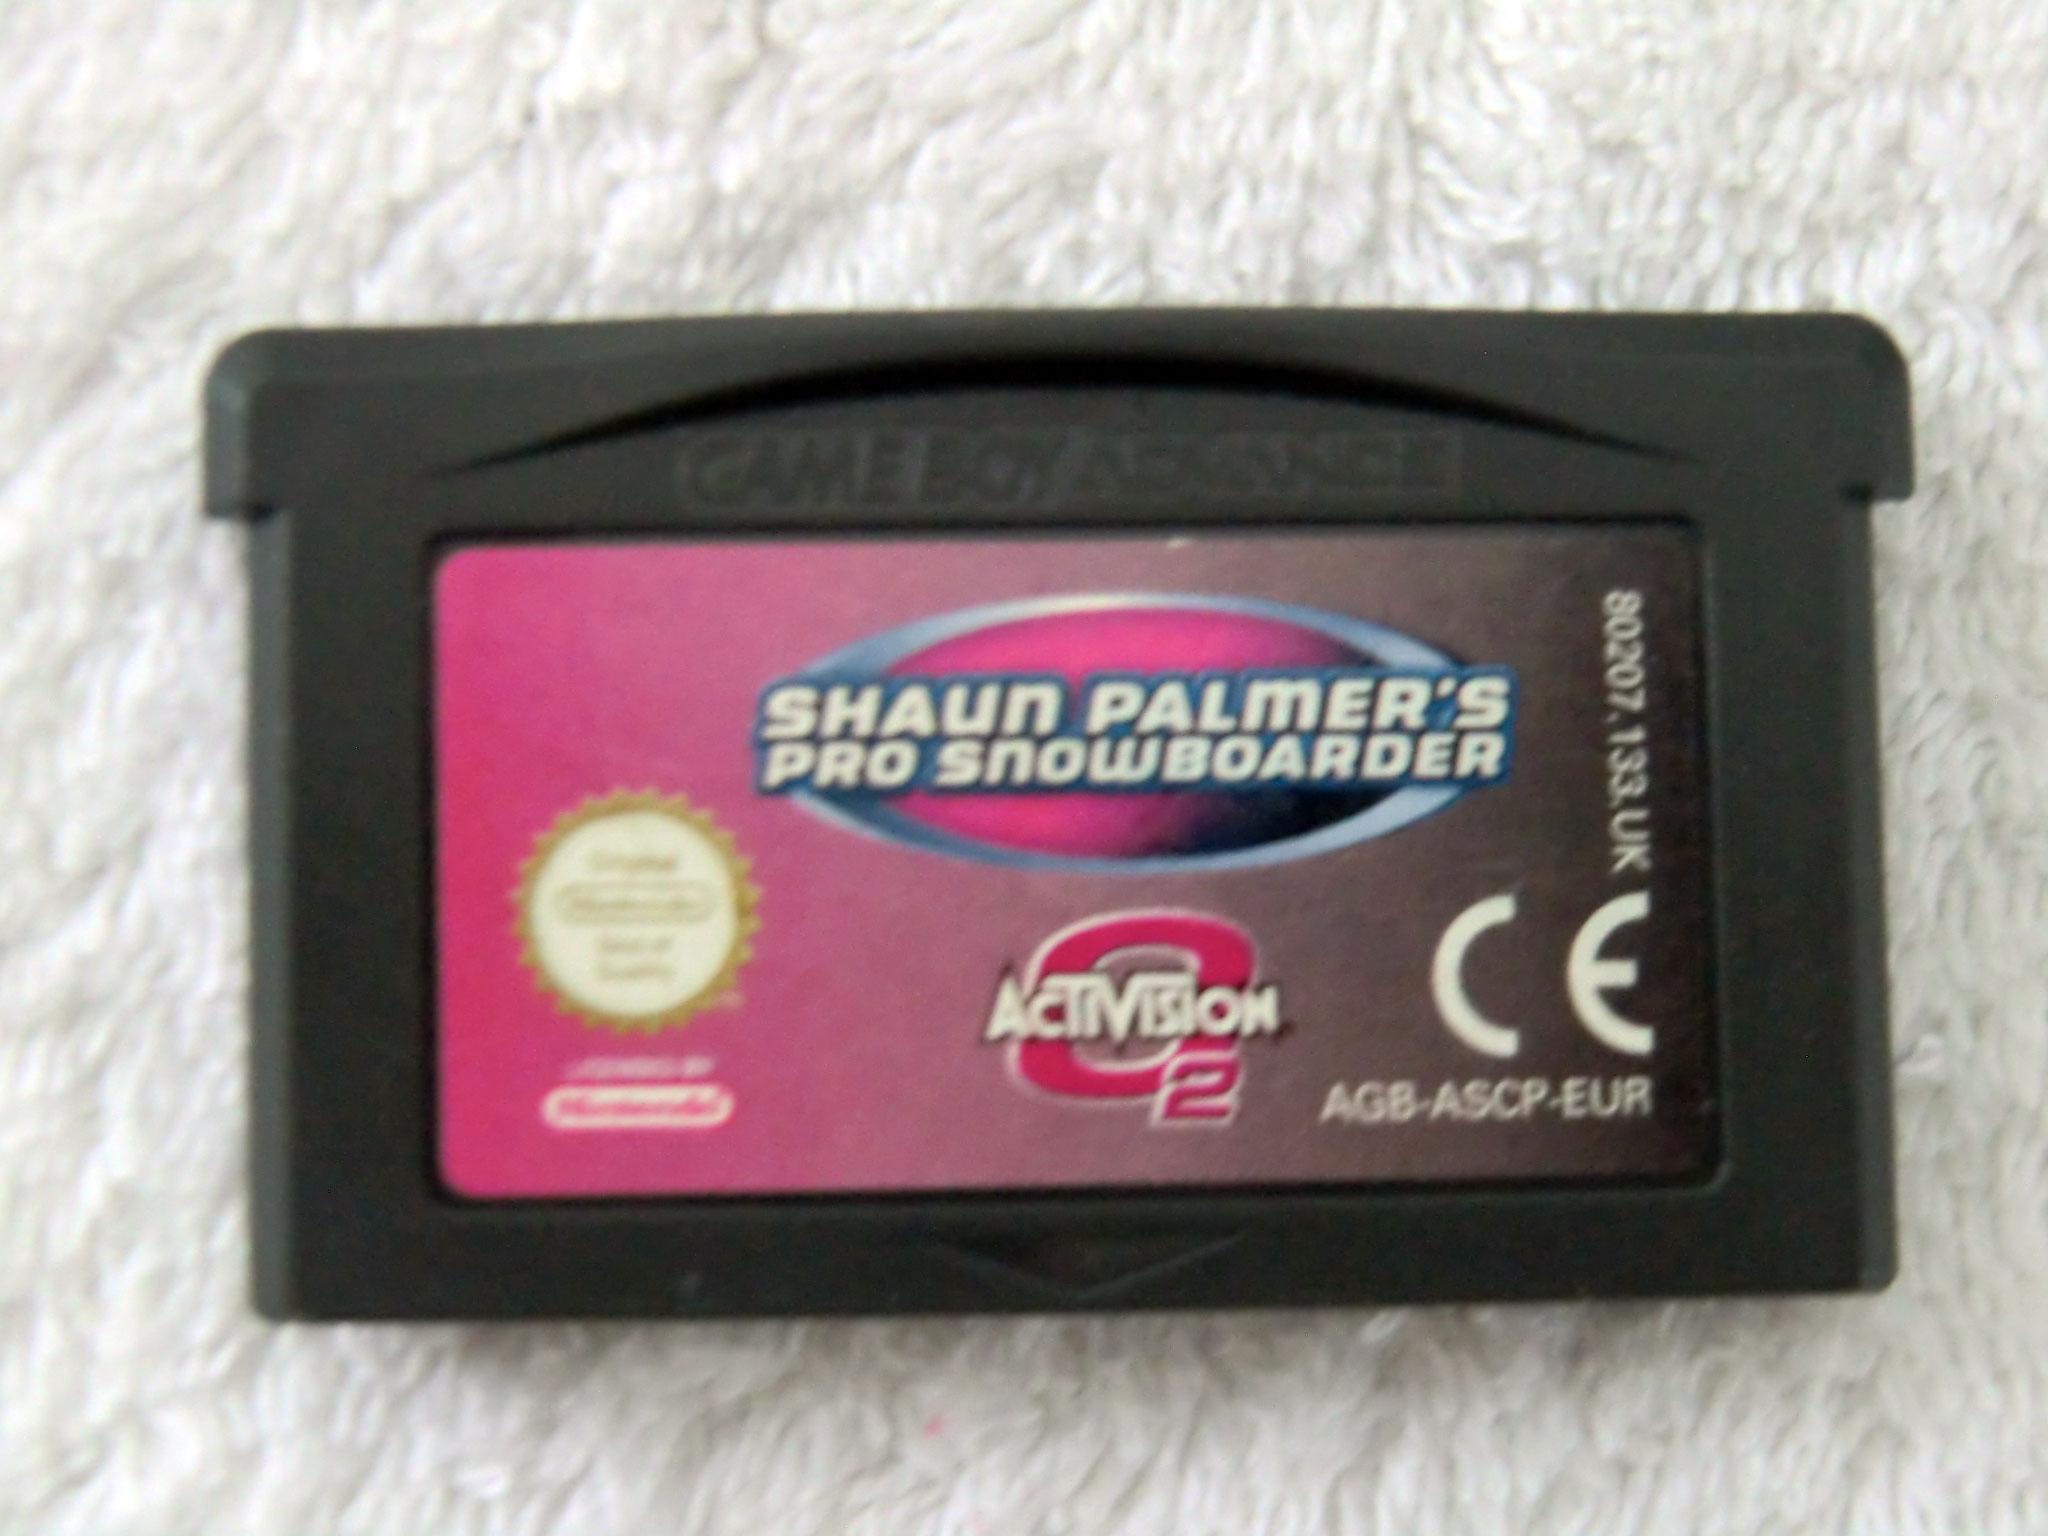 Game Boy Advance - Shaun Palmer's Pro Snowboarder - () AGB-ASCP-EUR